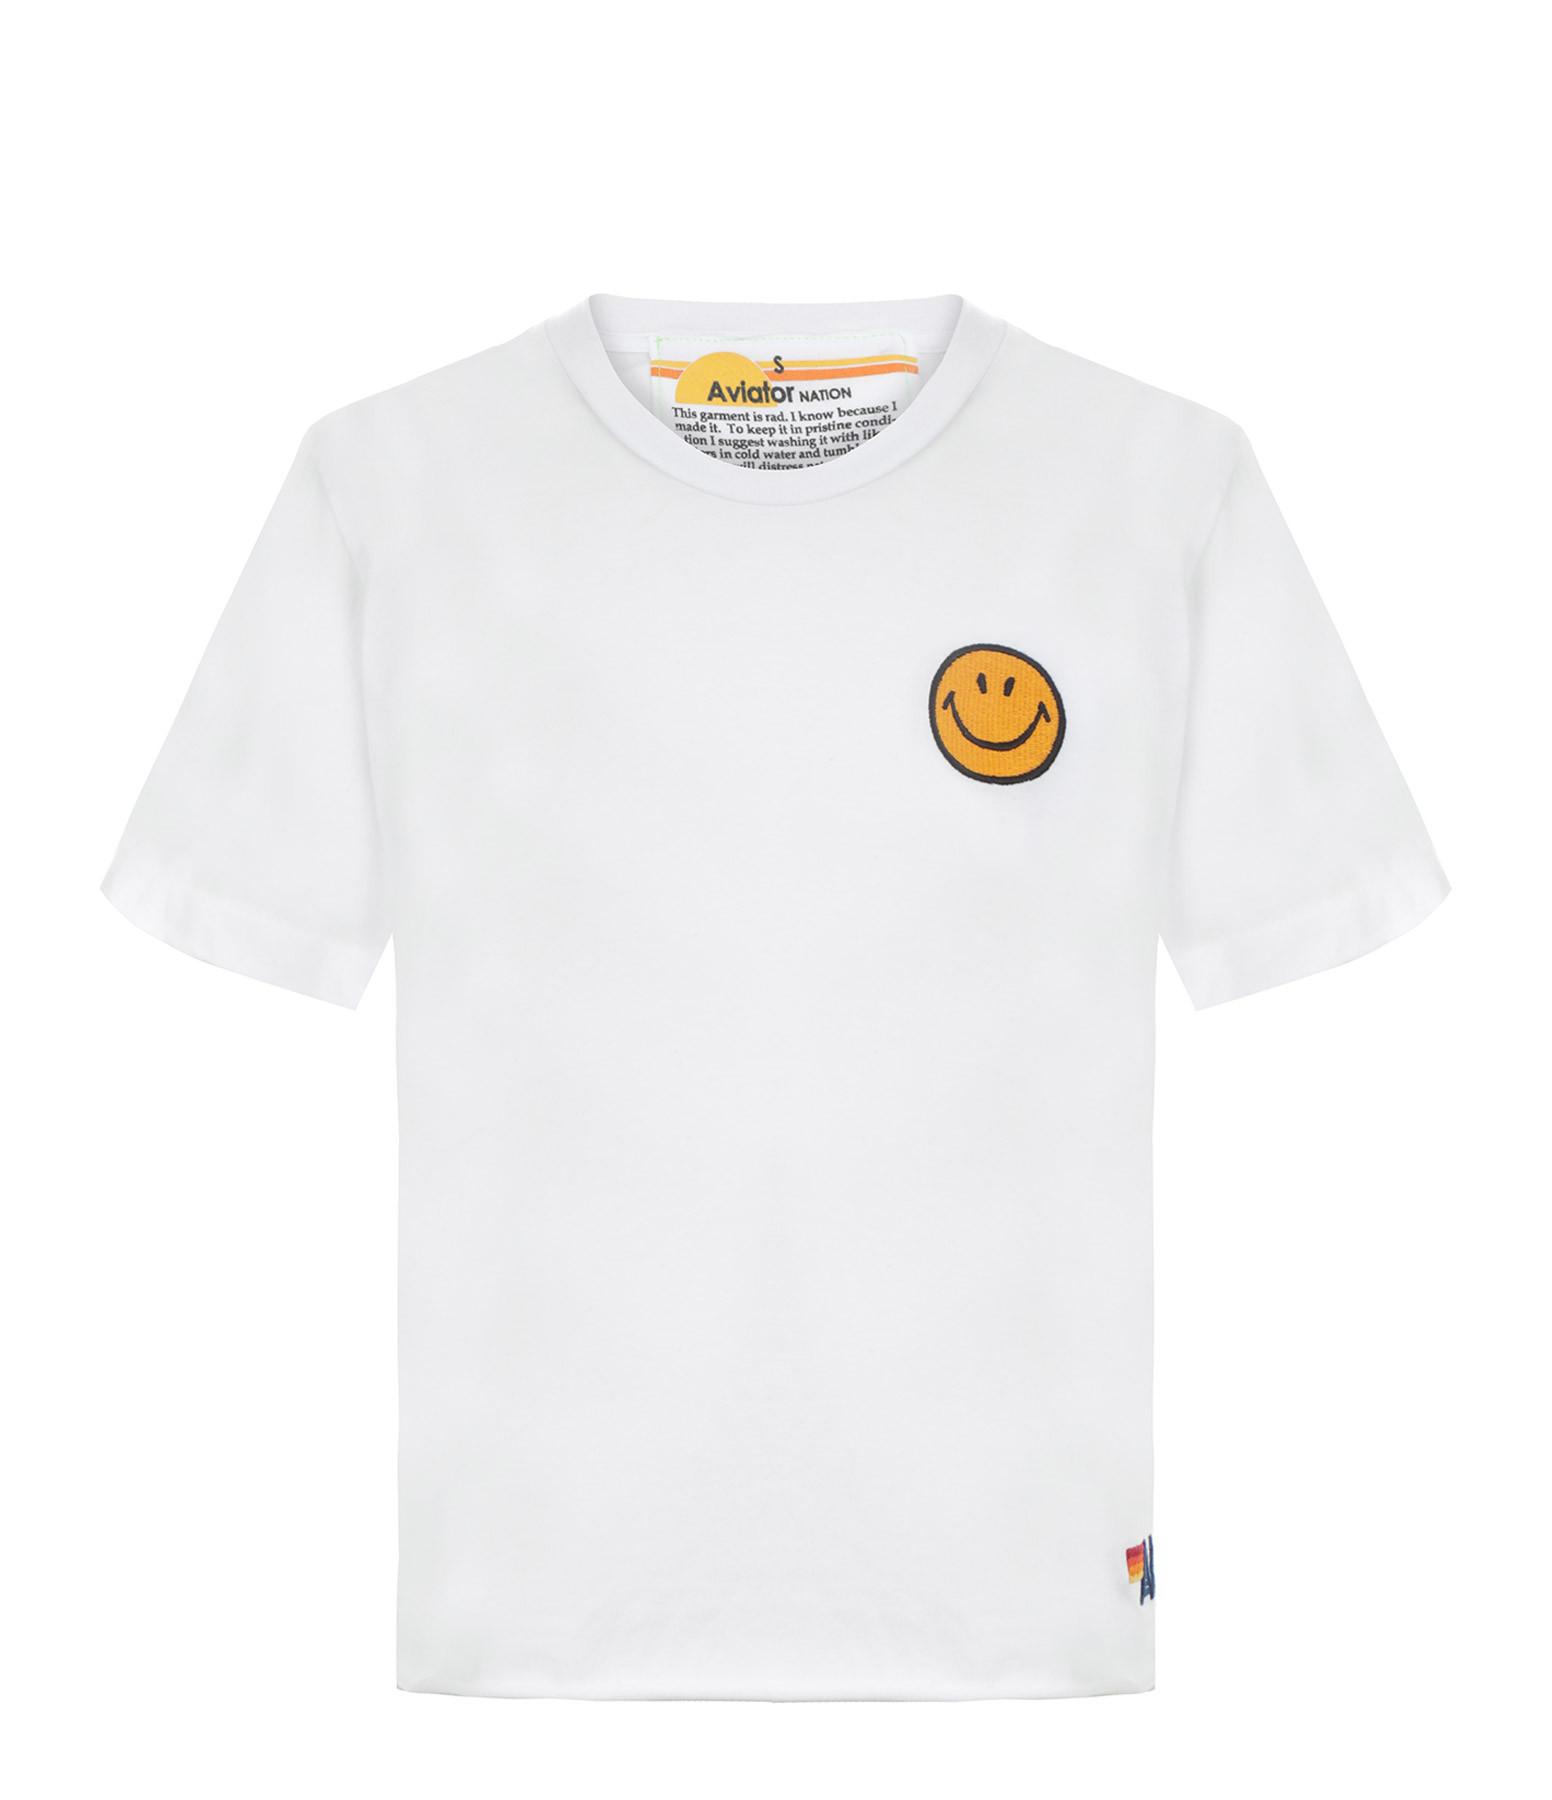 AVIATOR NATION - Tee-shirt Smiley Brodé Blanc